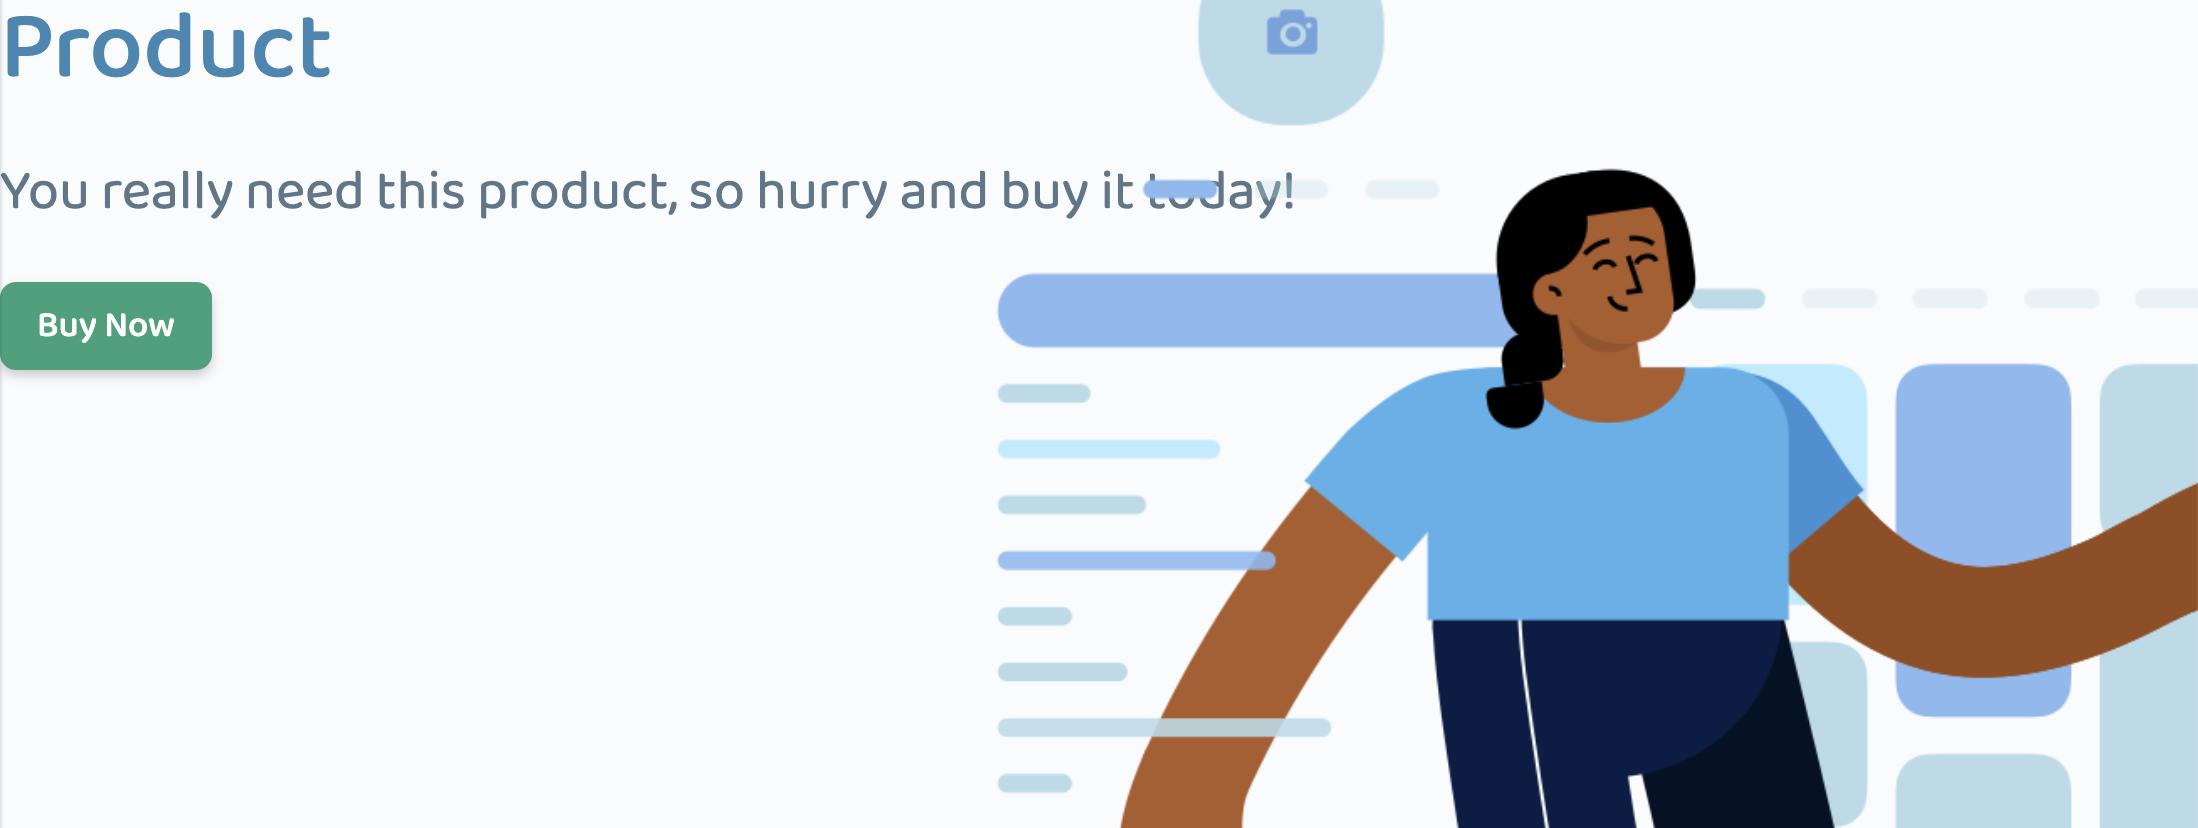 marketing hero progress with image styles